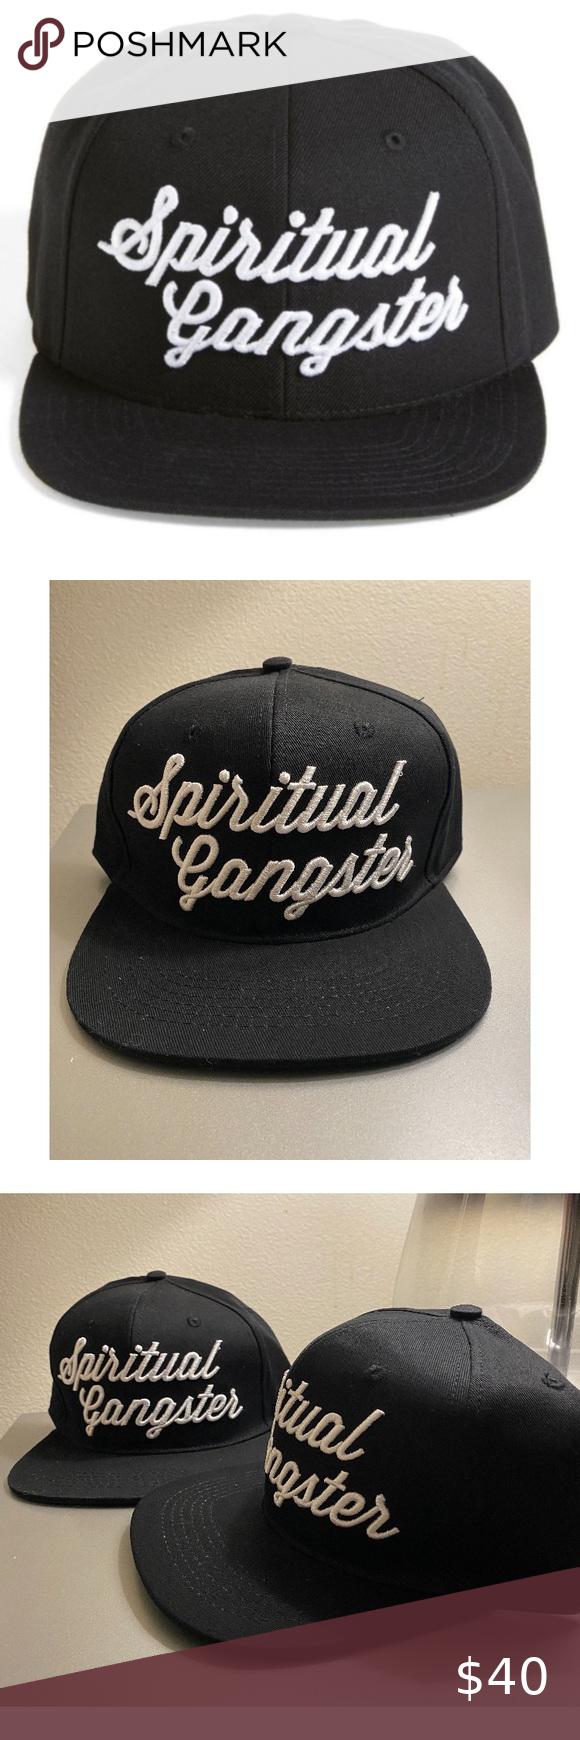 New Unisex Spiritual Gangster Black Snapback Hat Black Snapback Hats Black Snapback Snapback Hats